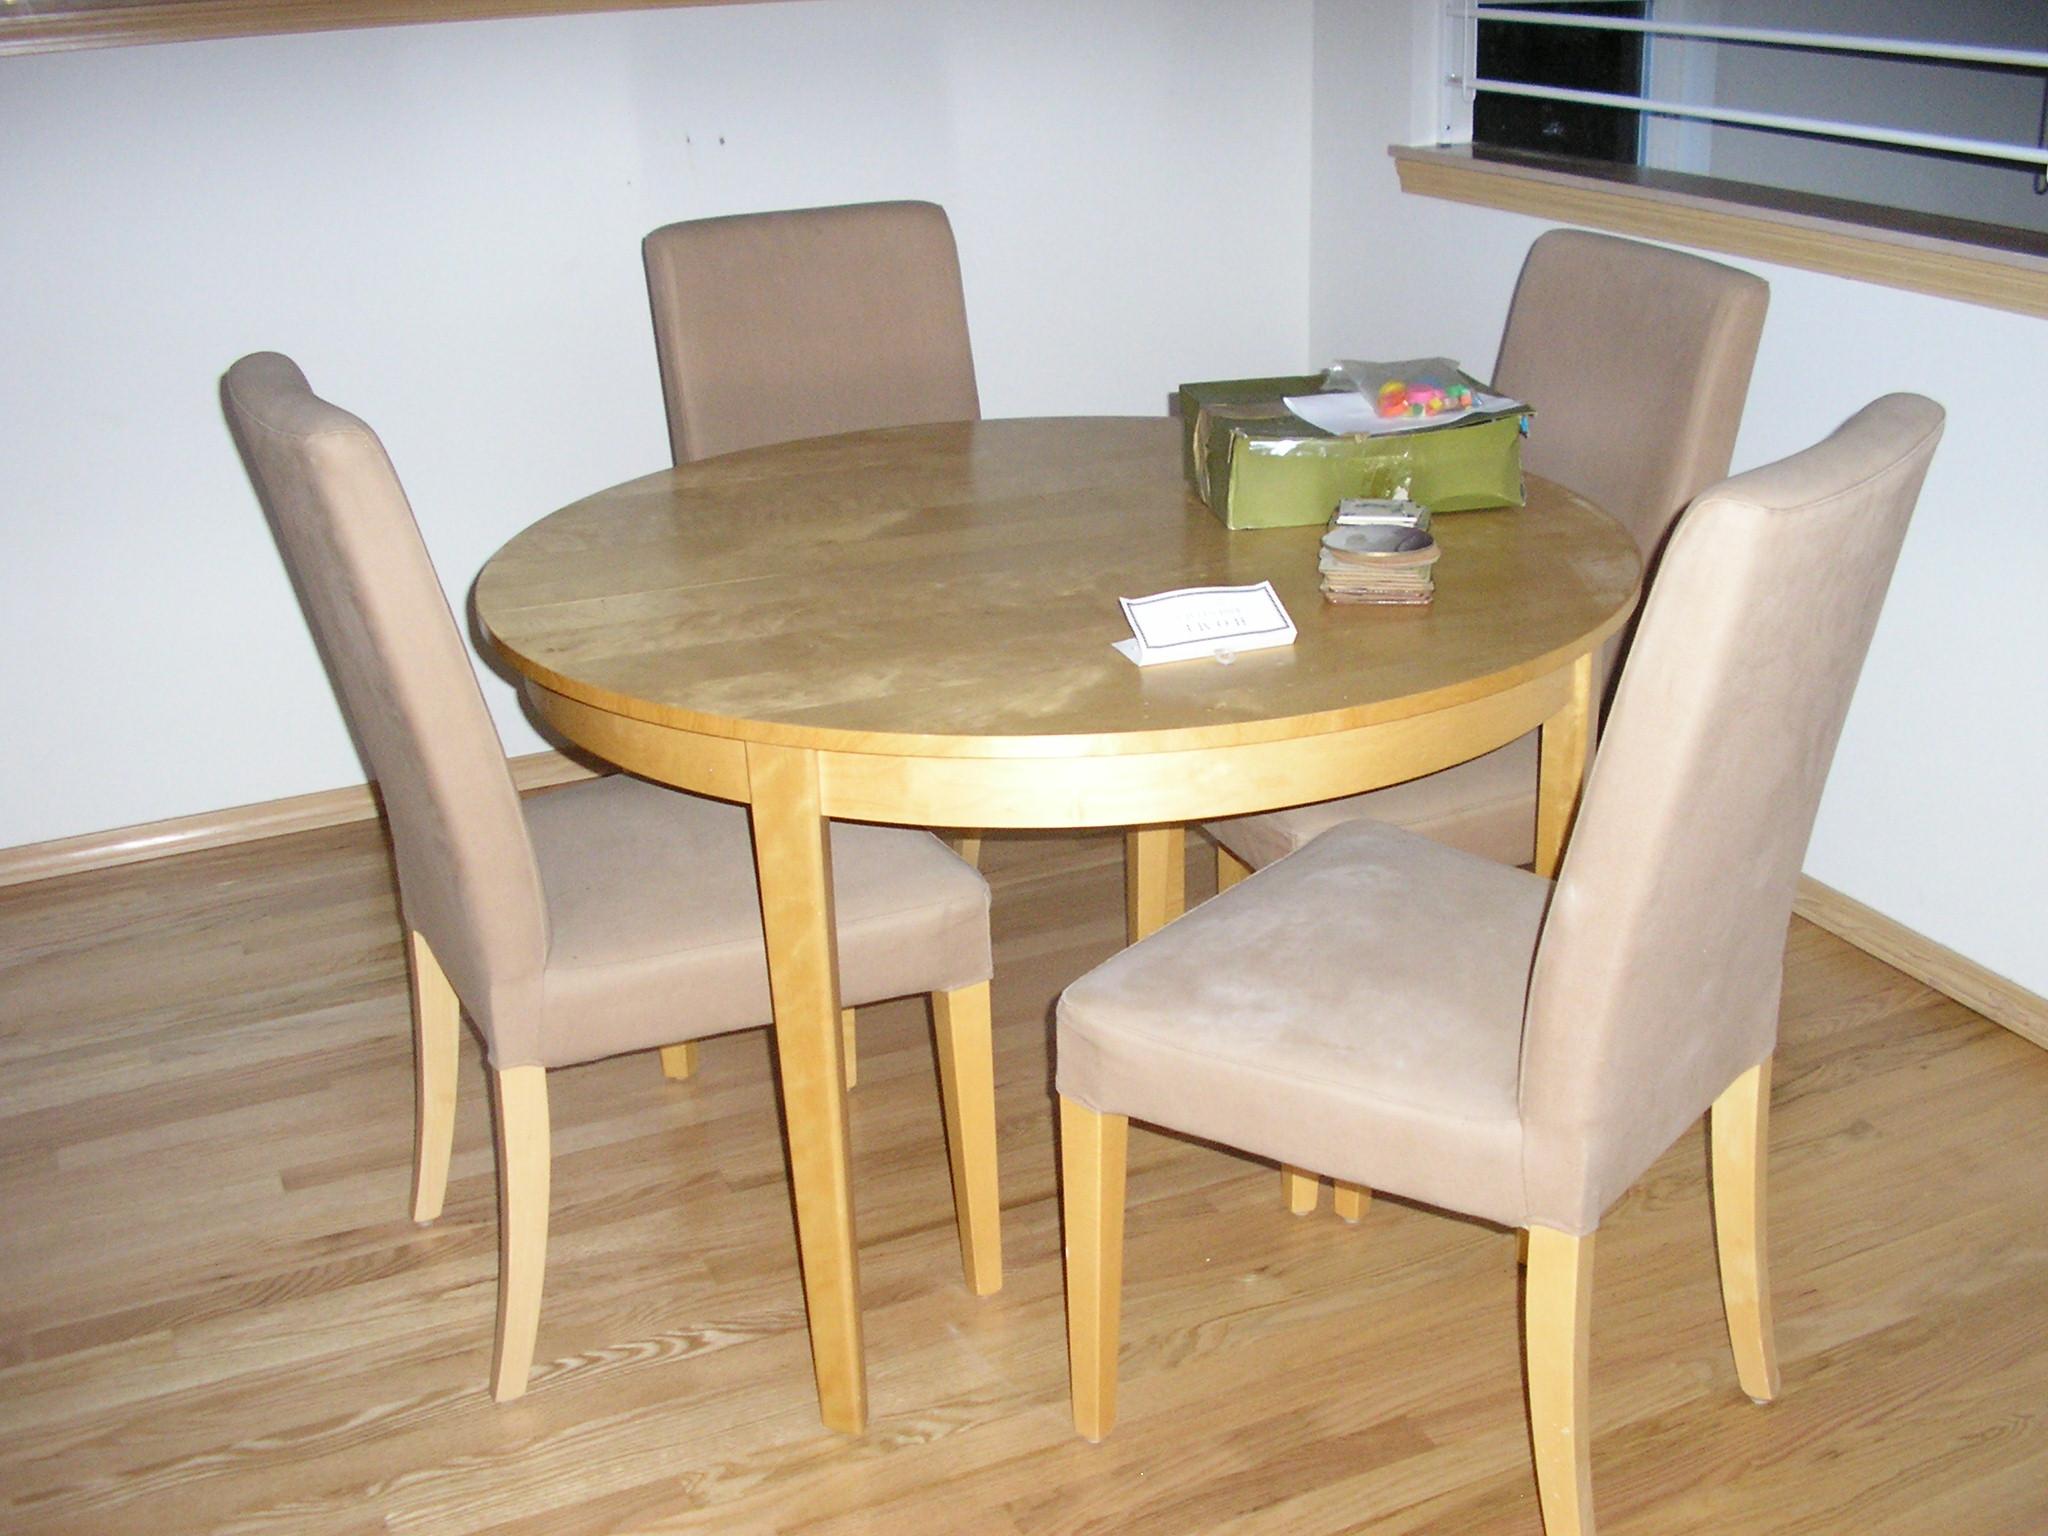 Kitchen round table sets photo - 3